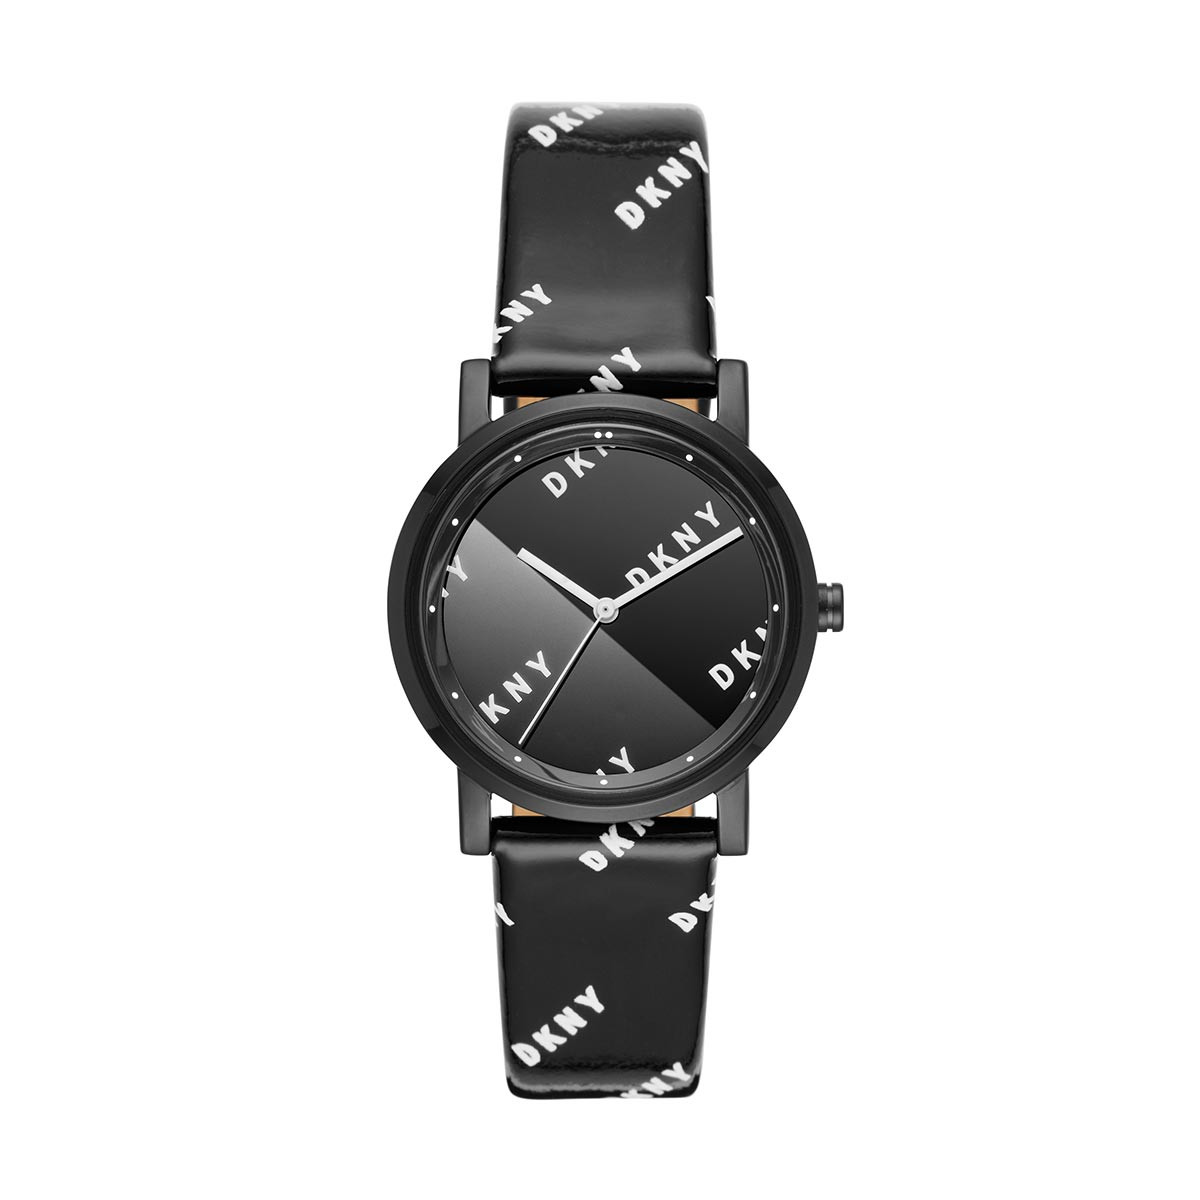 DKNY Uhr - NY2805 Soho Watch Black - in schwarz - für Damen